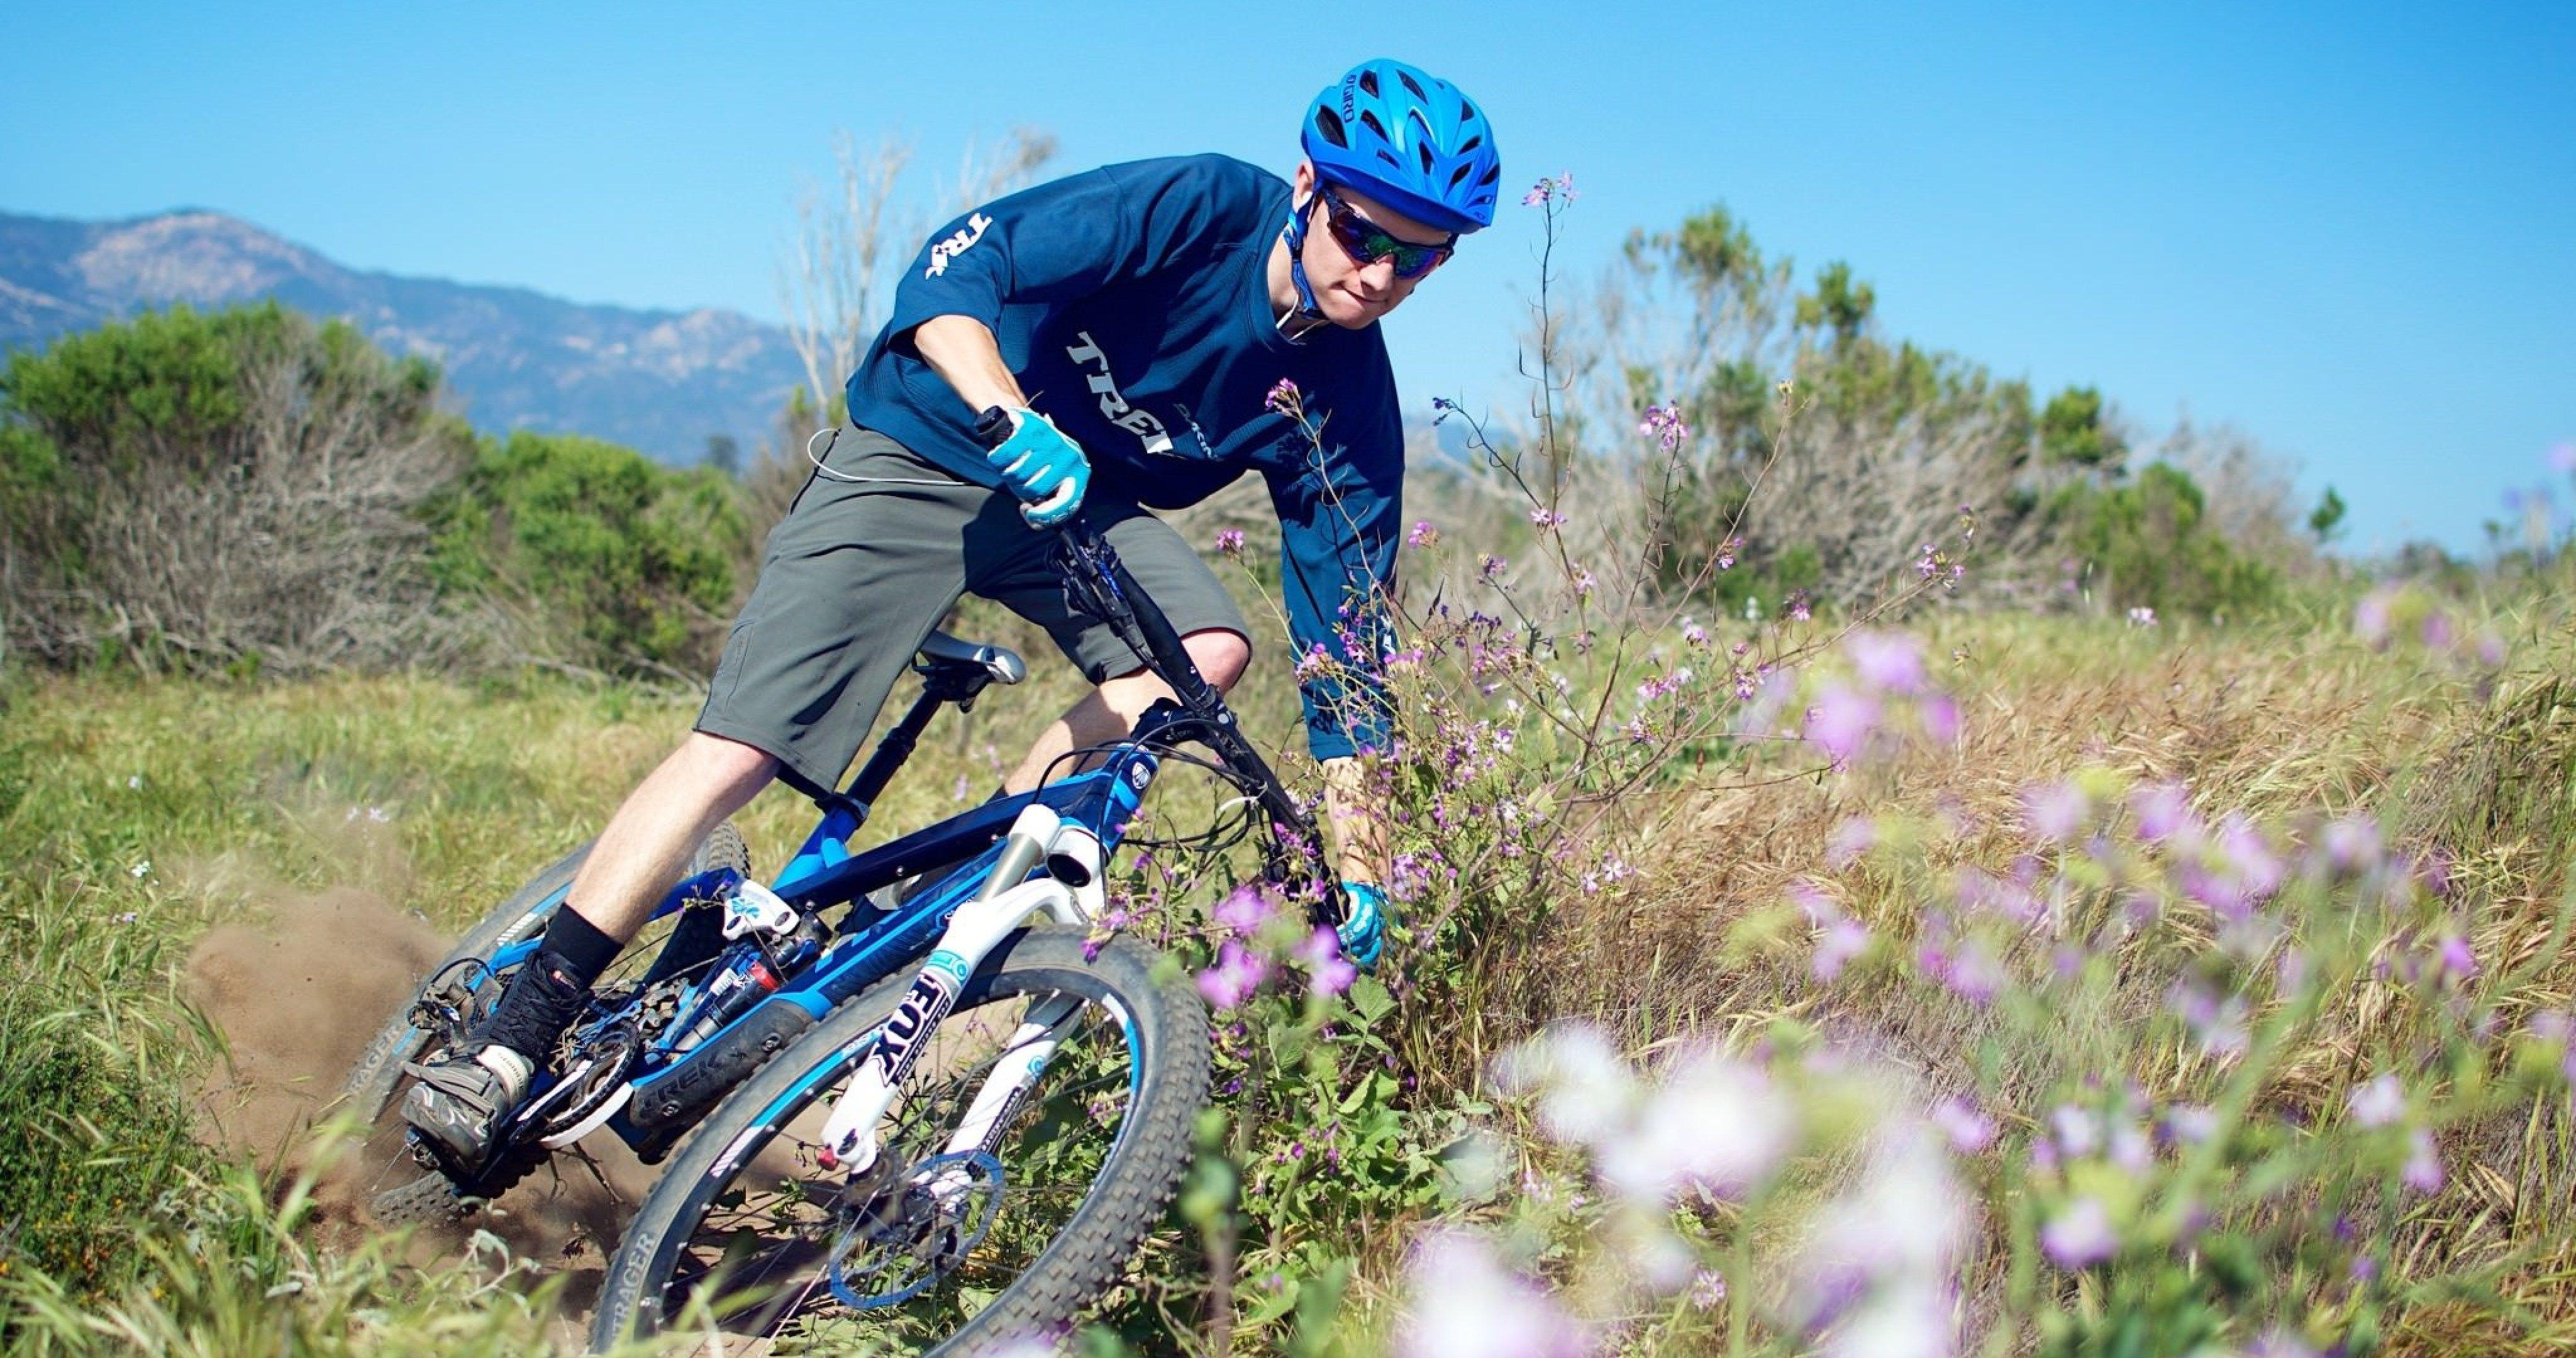 Mountain Biking 4k Ultra Hd Wallpaper Ololoshenka Hd Wallpaper